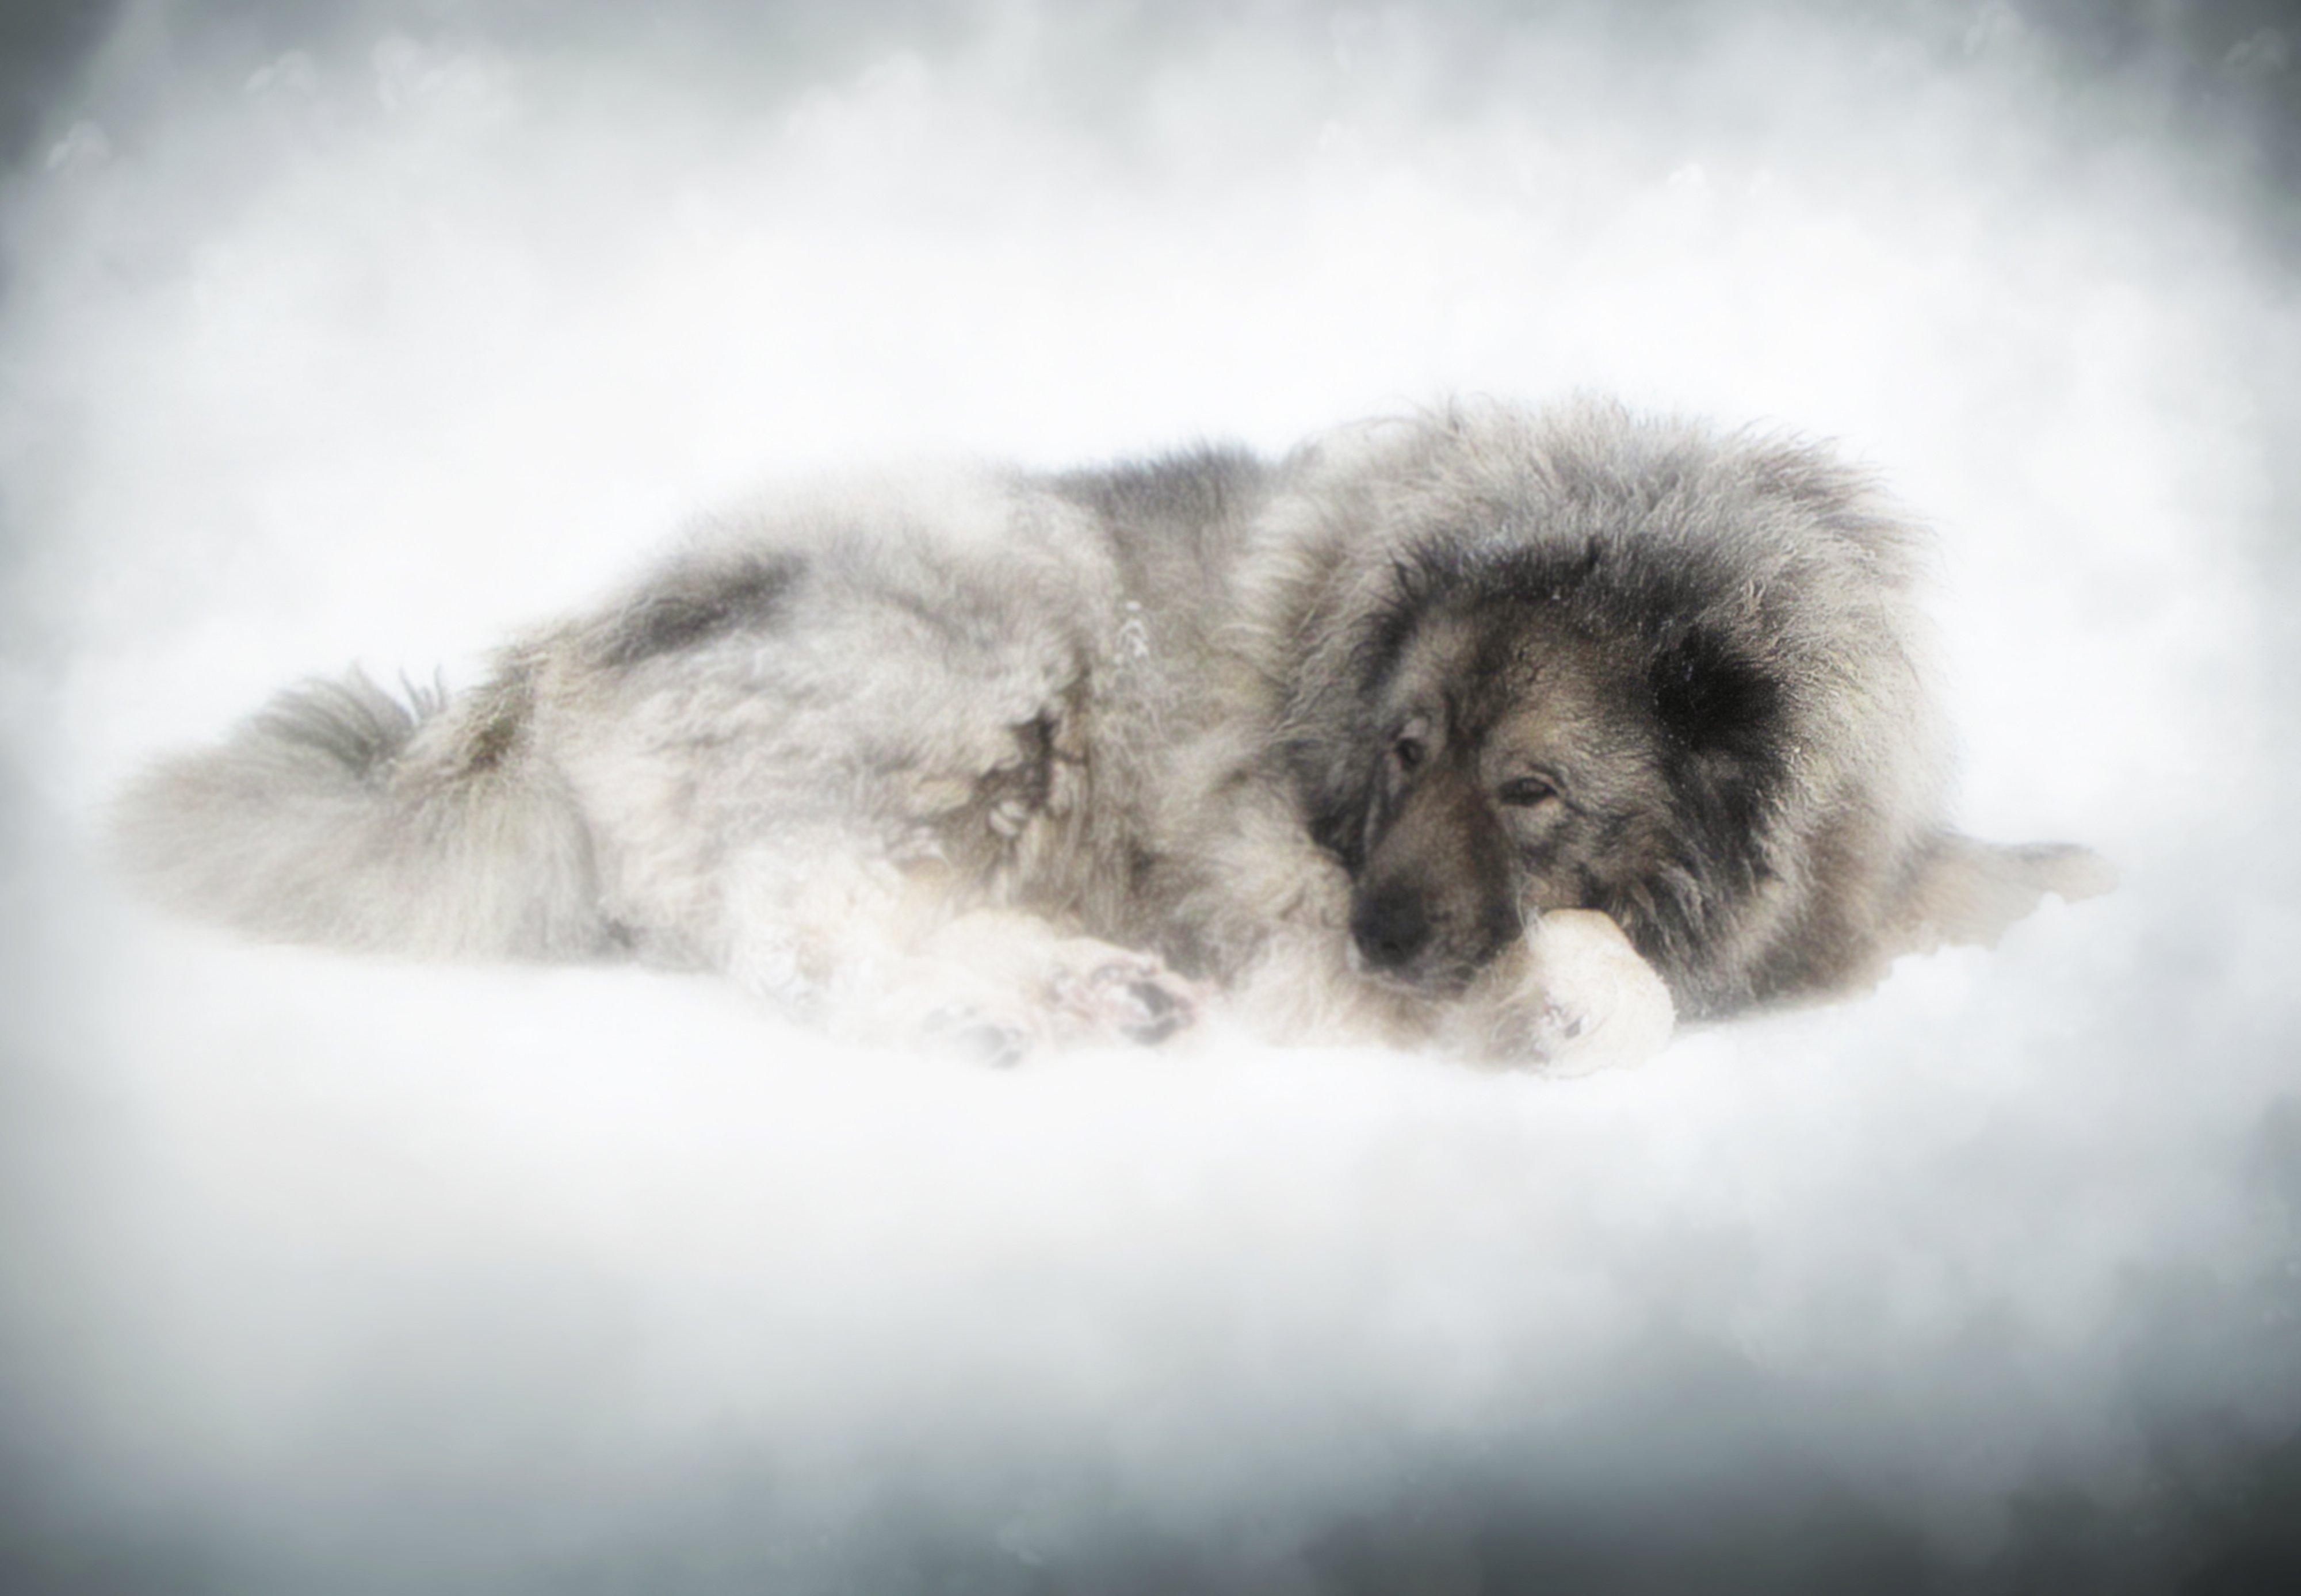 mist,day, country, countryside, outdoor, winter,tree,road,snow,animal, dog,, Dzintra Regina  Jansone